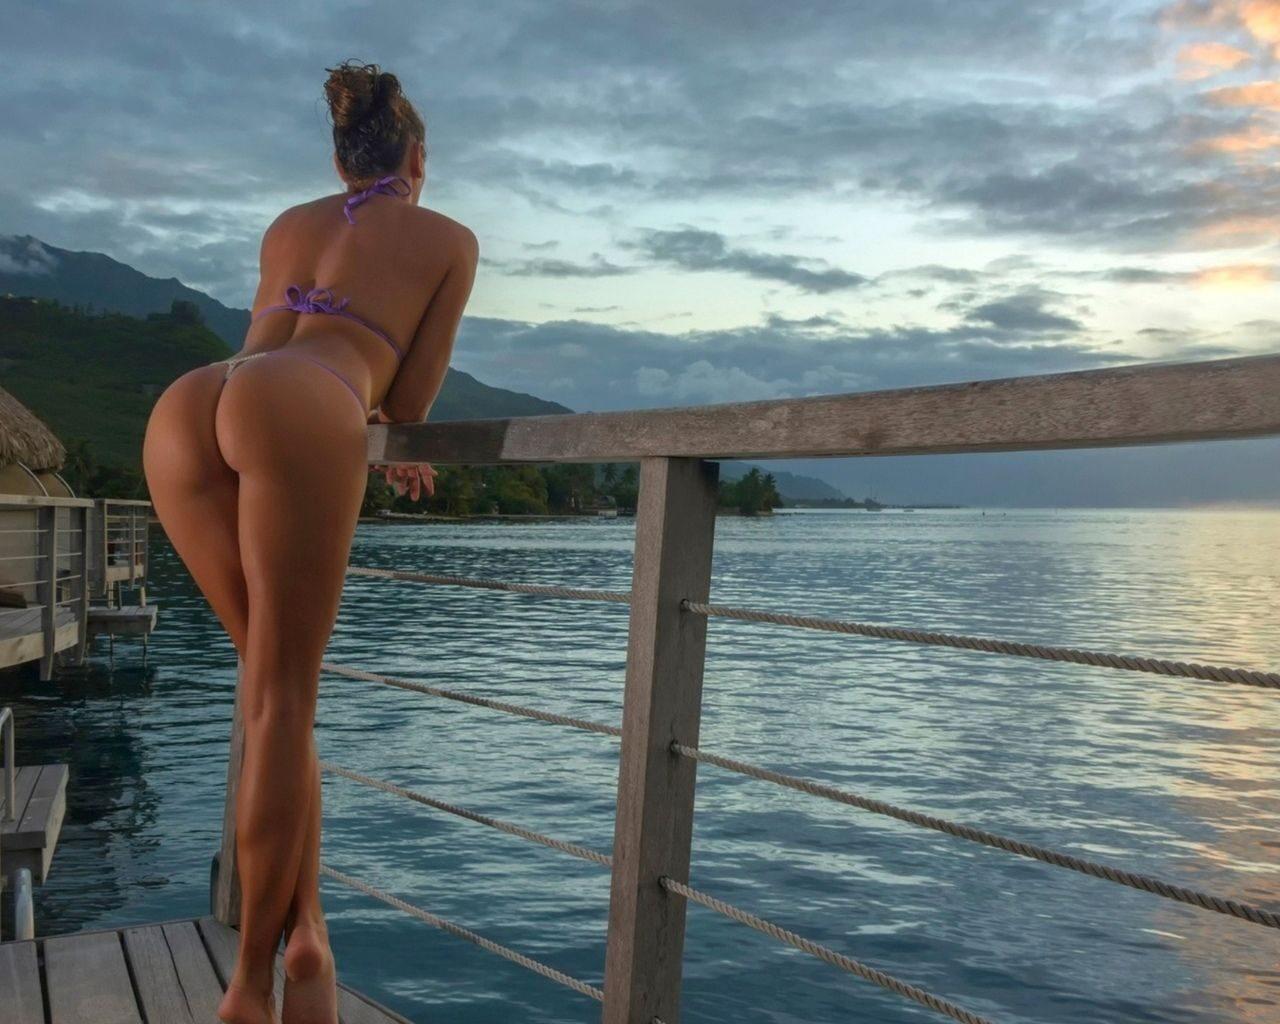 mnogo-huev-oboi-krasivie-devushki-fotomodeli-v-bikini-foto